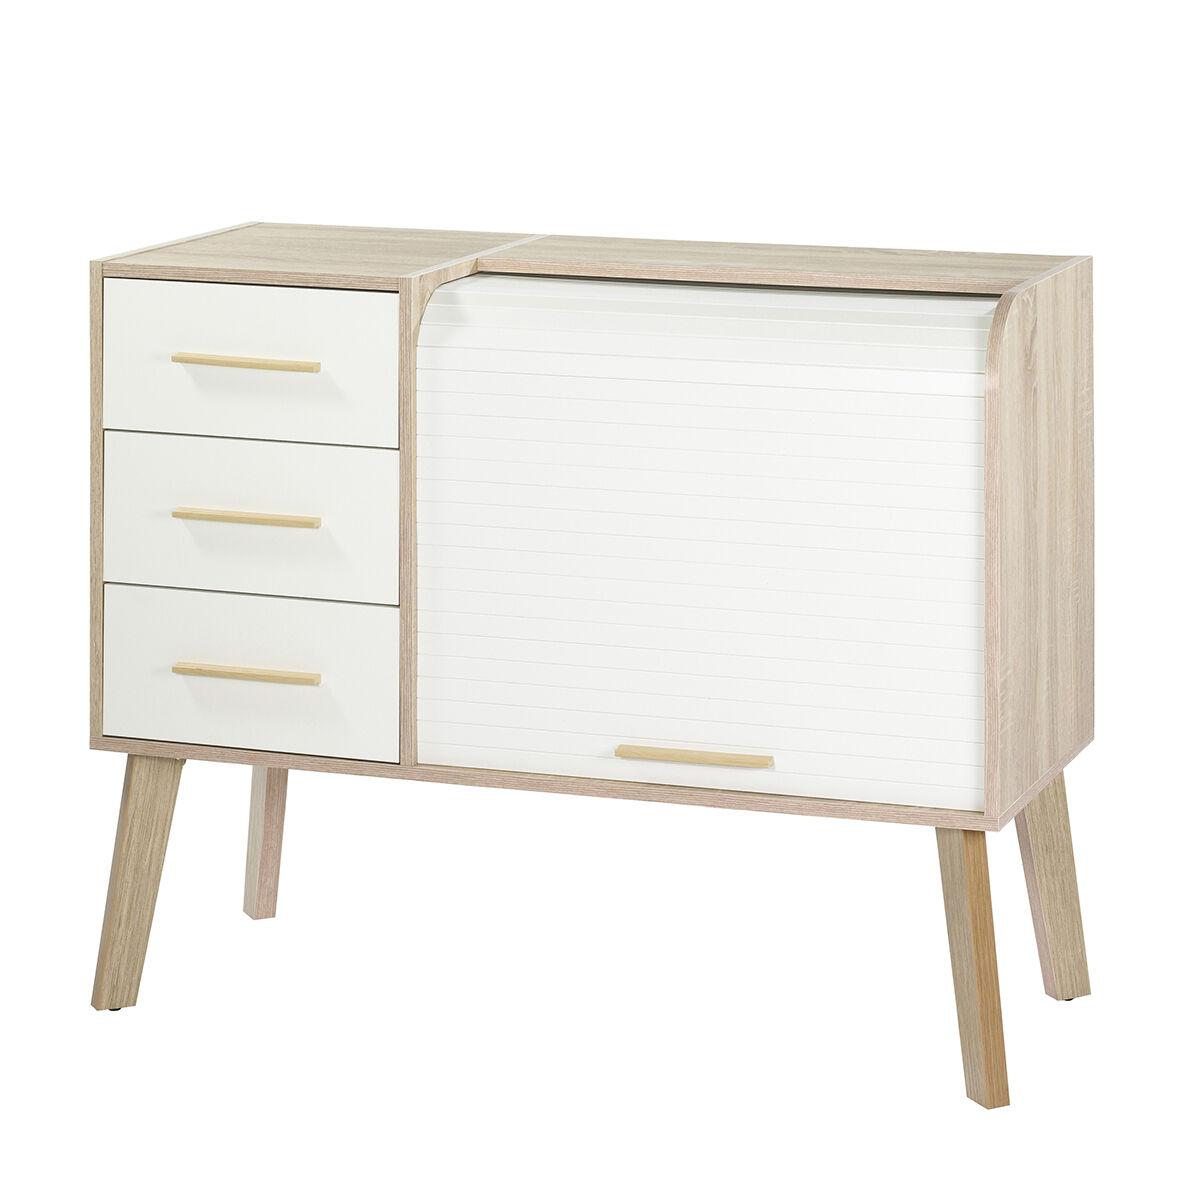 meuble cylindre vintage 3 tiroirs blancs pieds chene rideau blanc